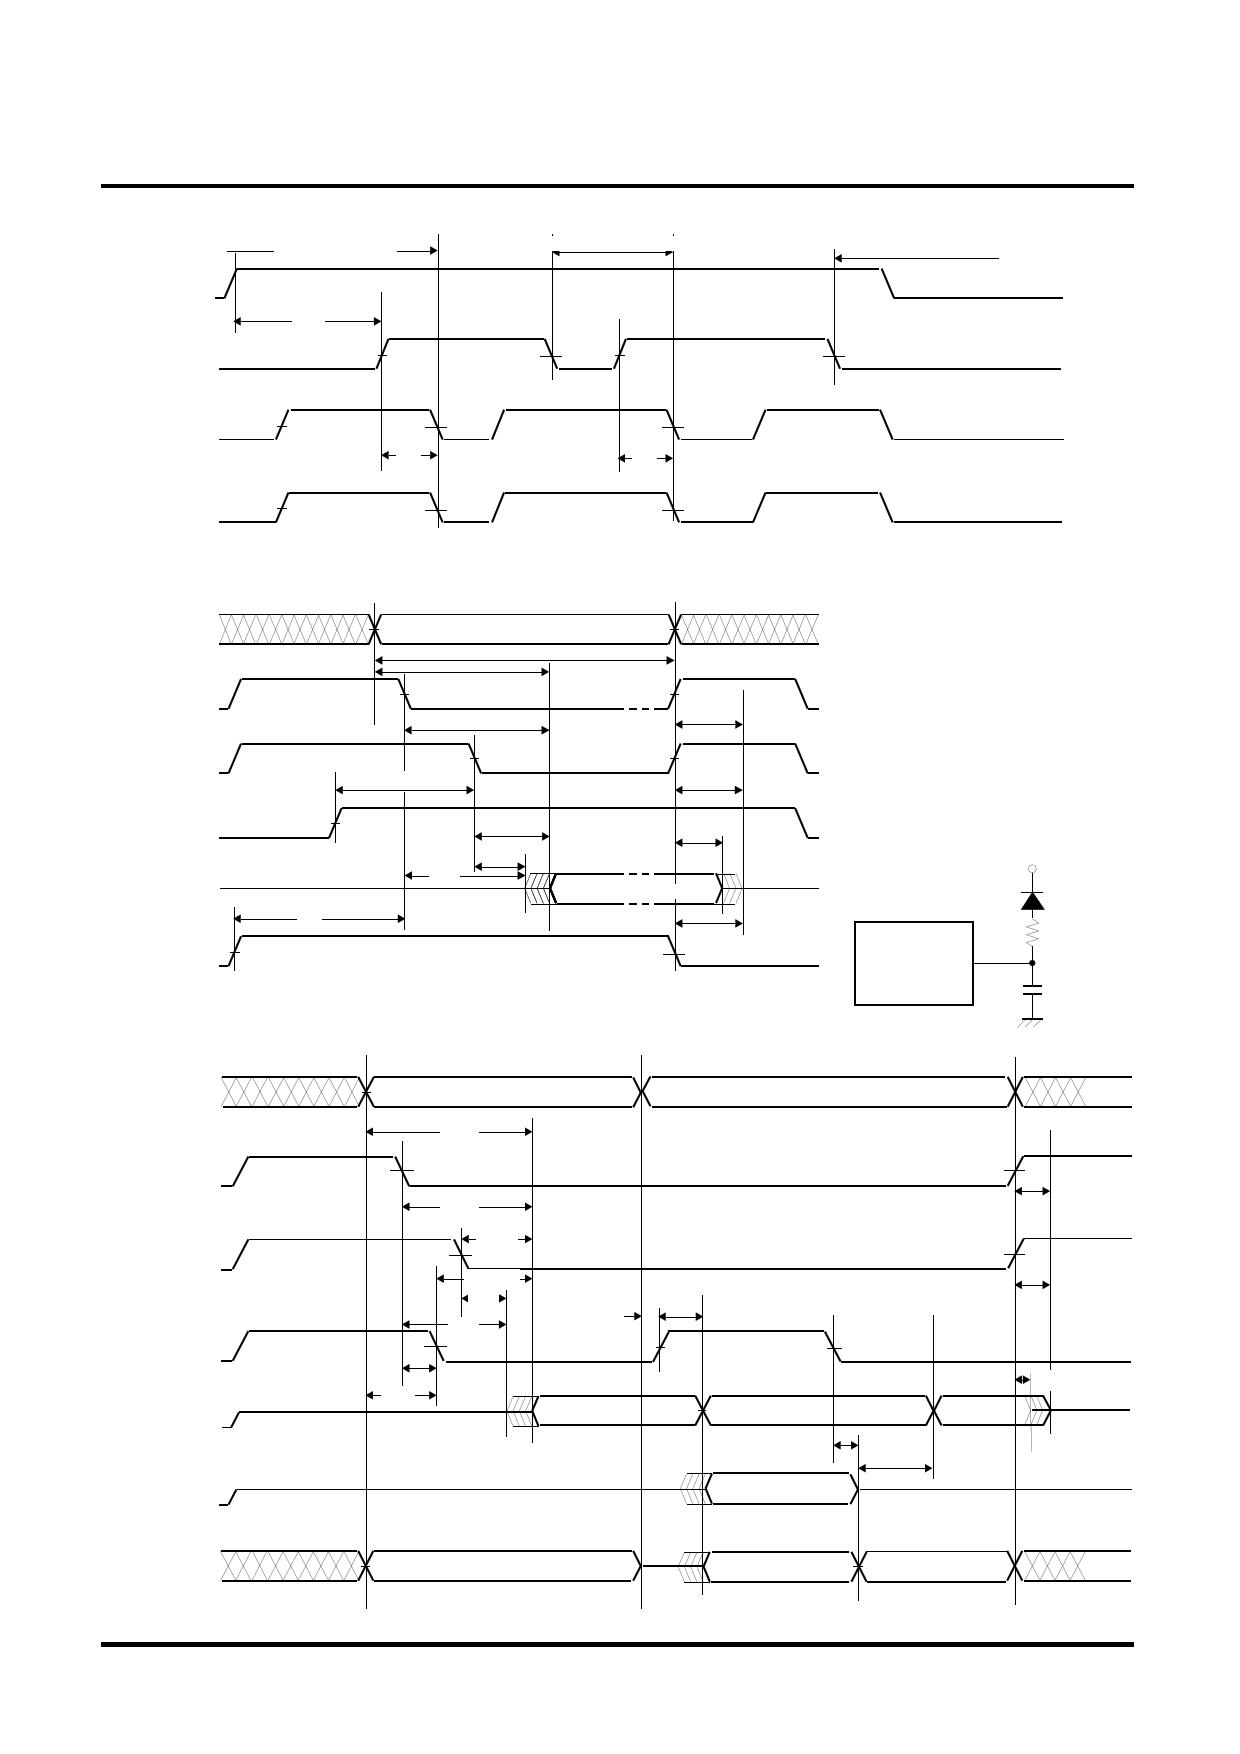 M5M29FB800VP-10 transistor, diode fet, igbt, scr